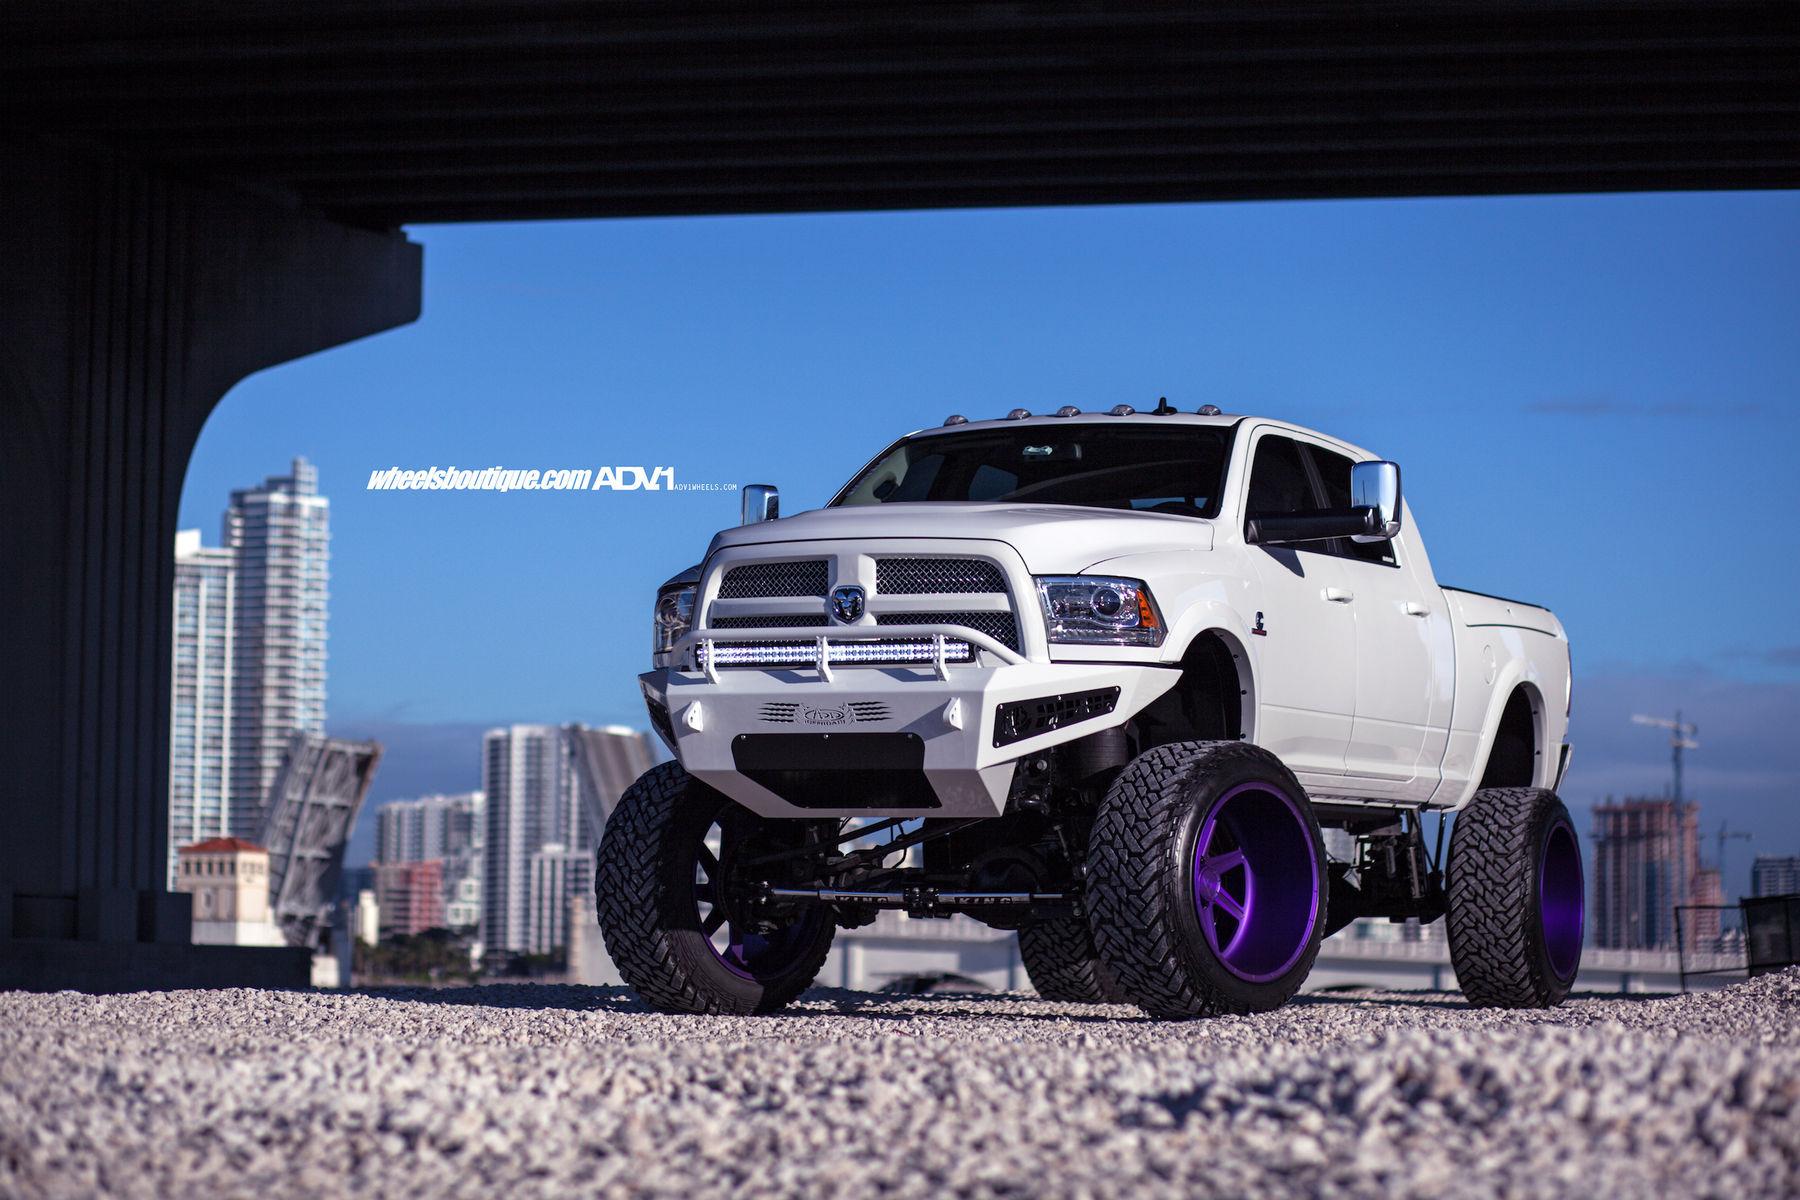 Dodge Ram Pickup 2500 | Dodge Ram Cummins 2500HD